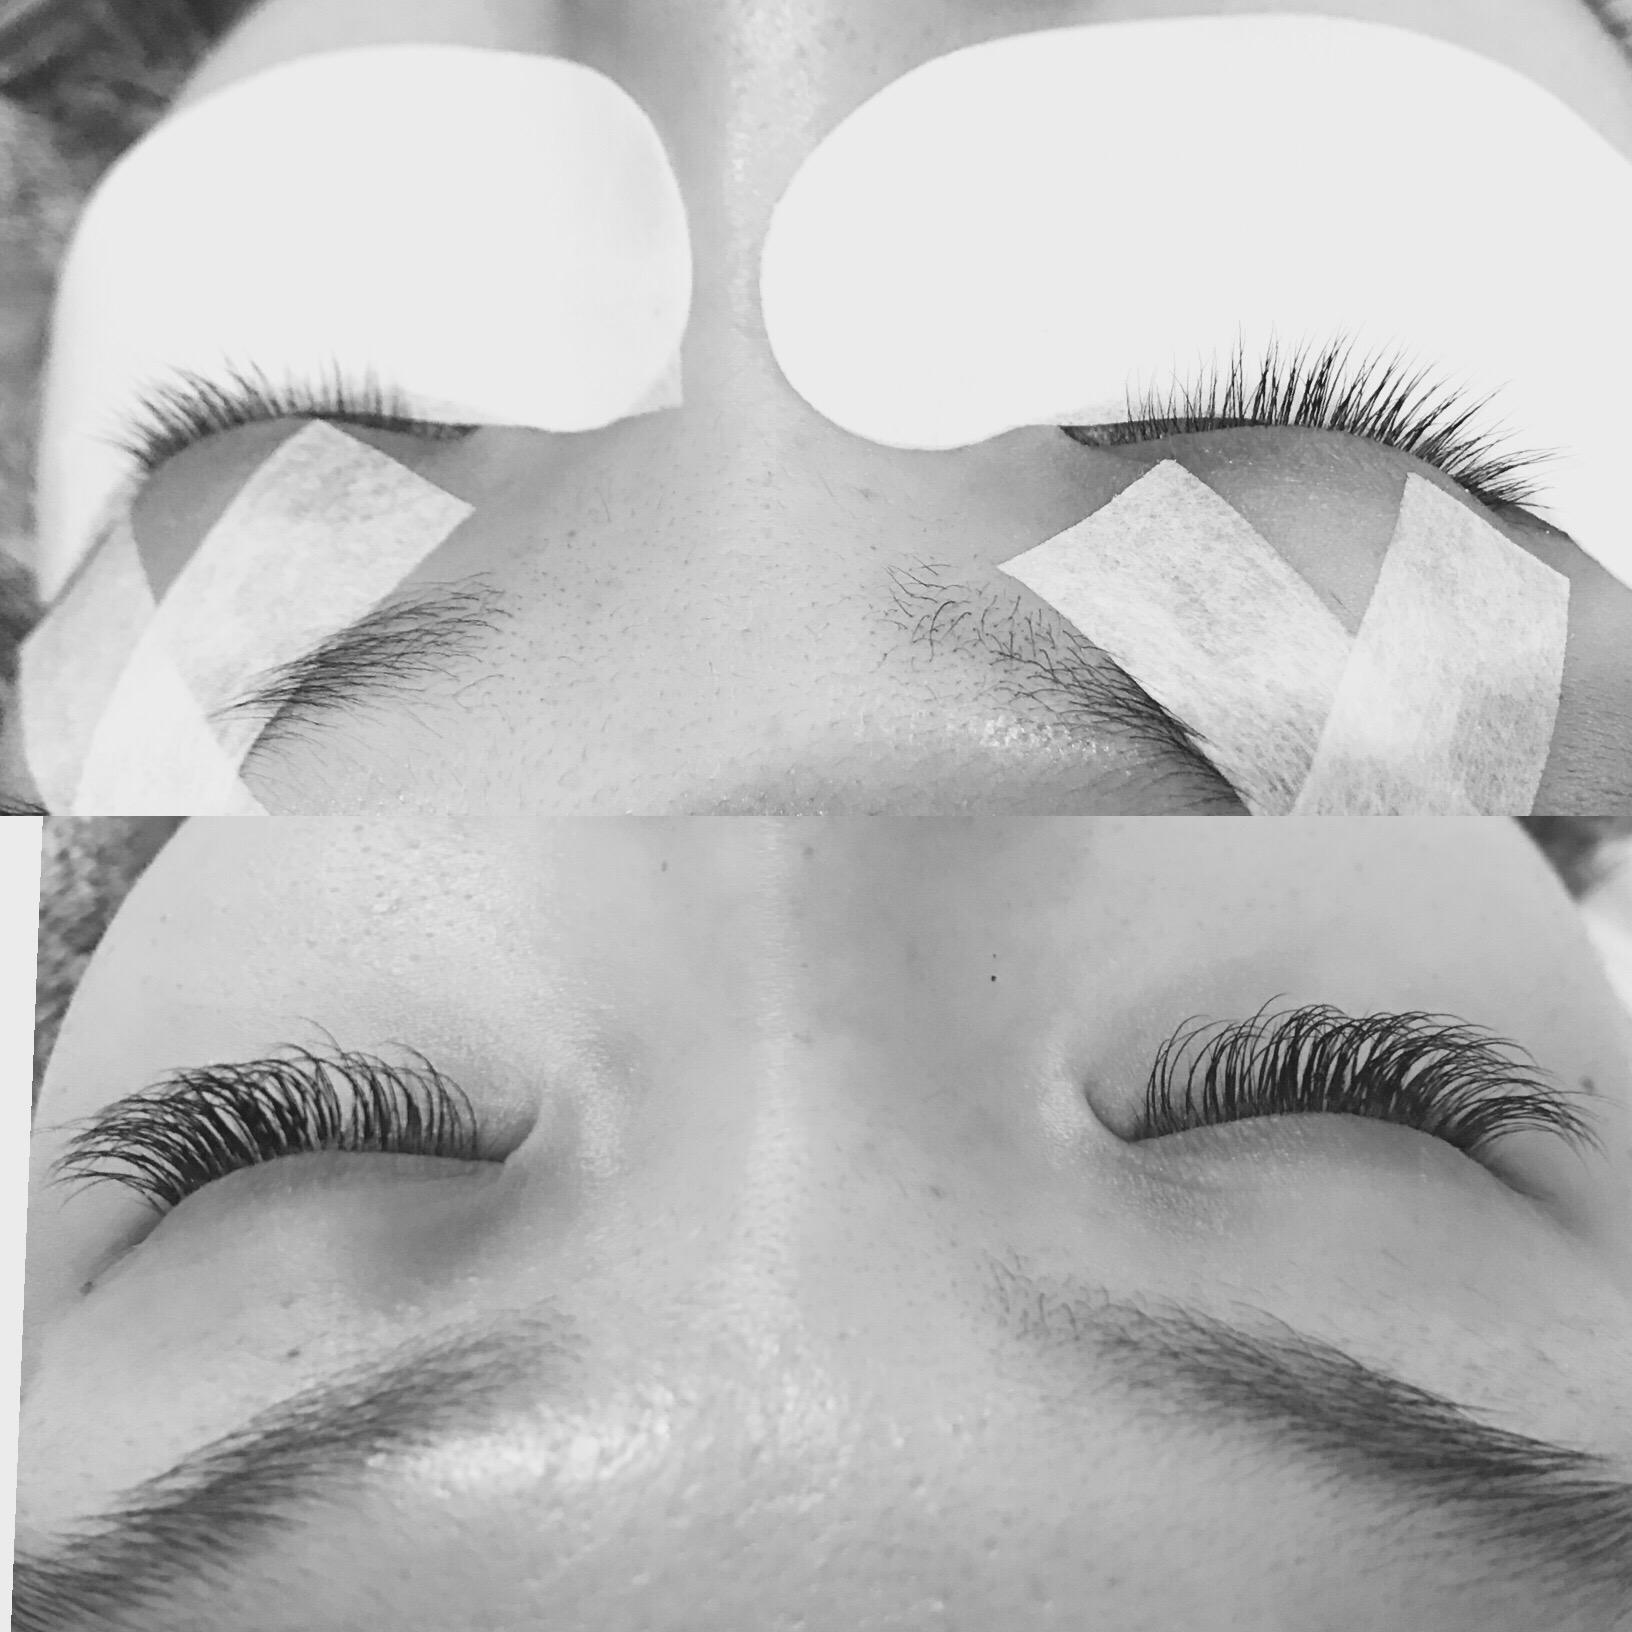 Eyelash Extensions The Splurge You Deserve: Let's Talk Lashes